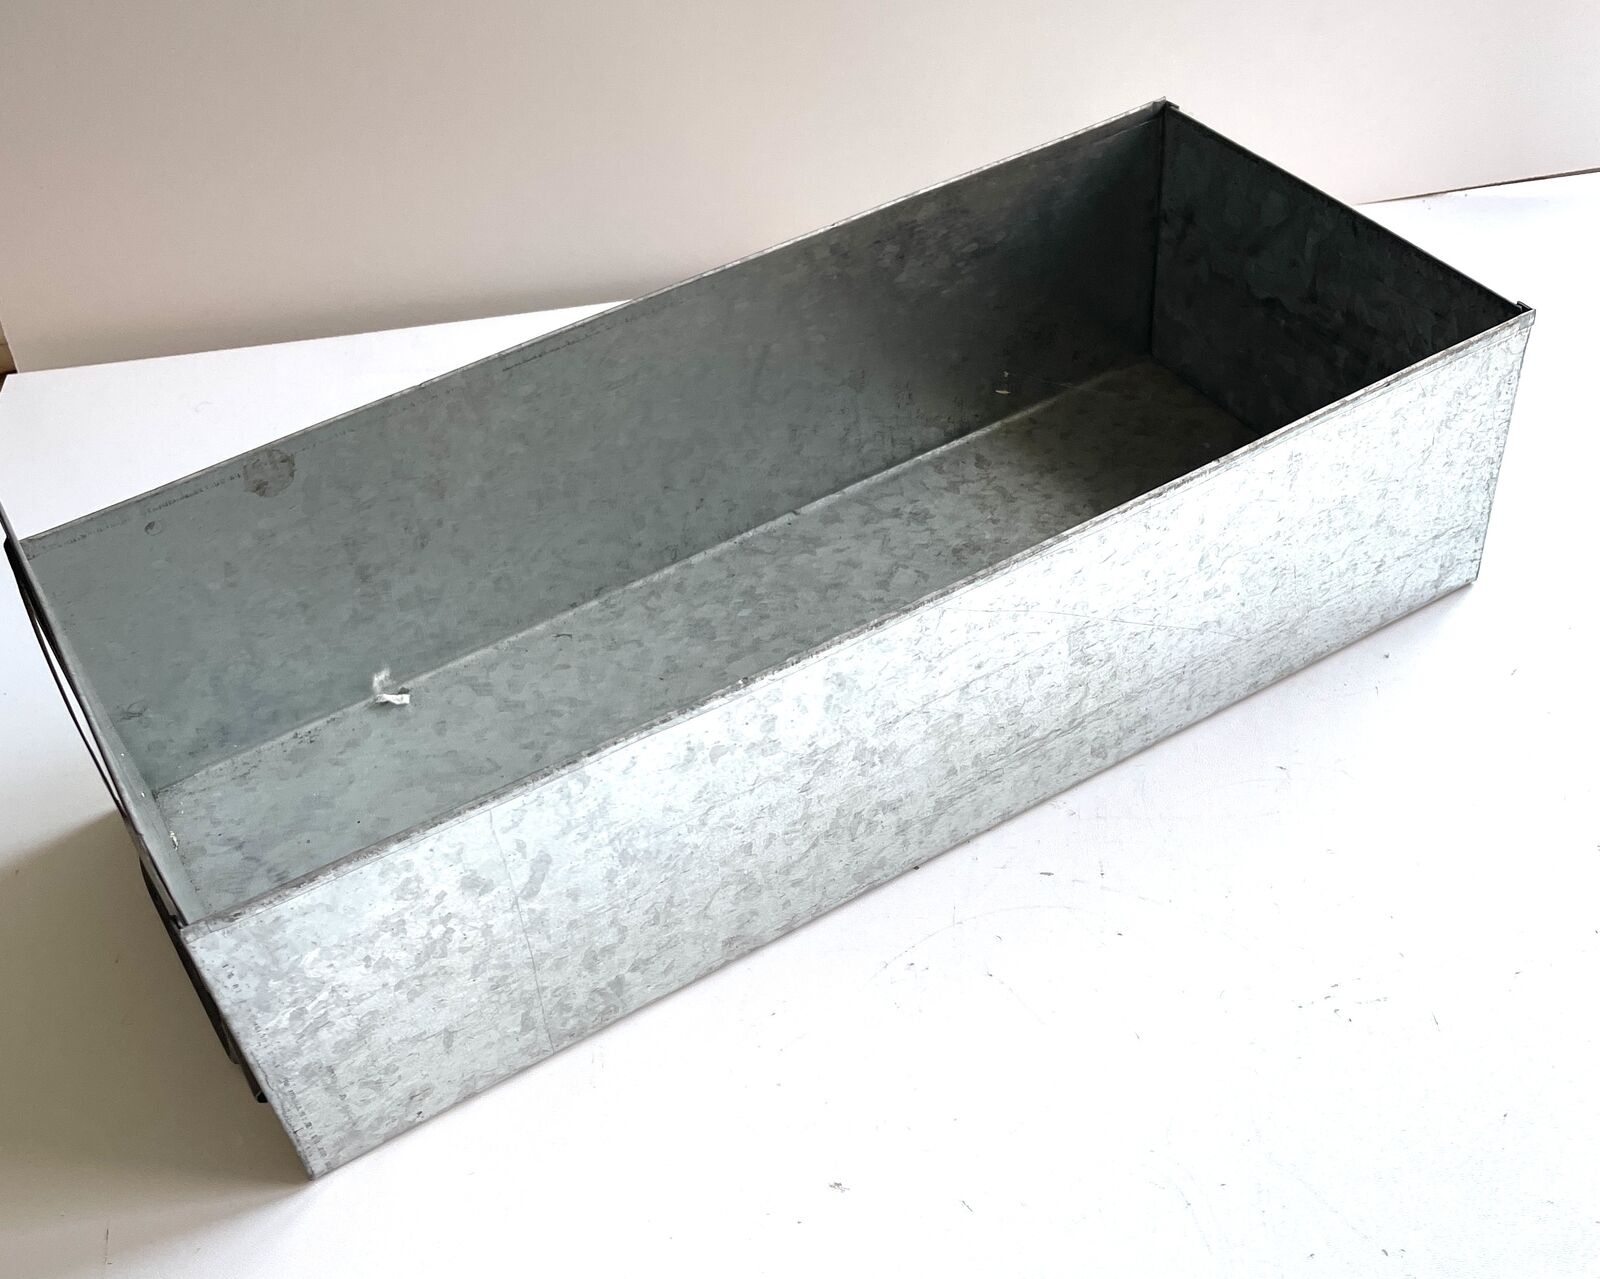 2x Bosch metal corredera recuadro caja cajón campamento lagerbox caja caja metalica